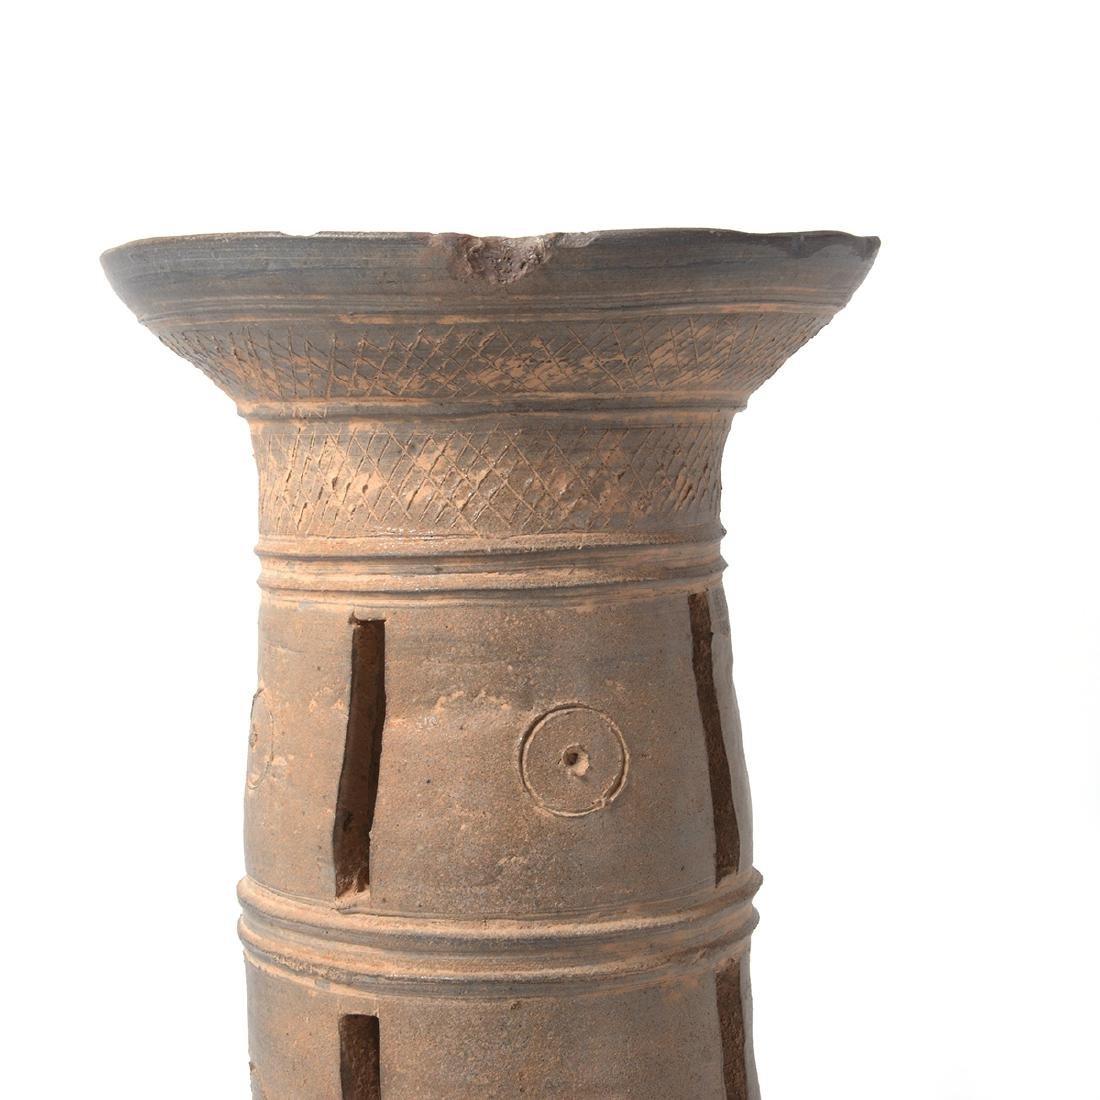 Two Korean Ceramic Stands, Silia Dynasty - 4